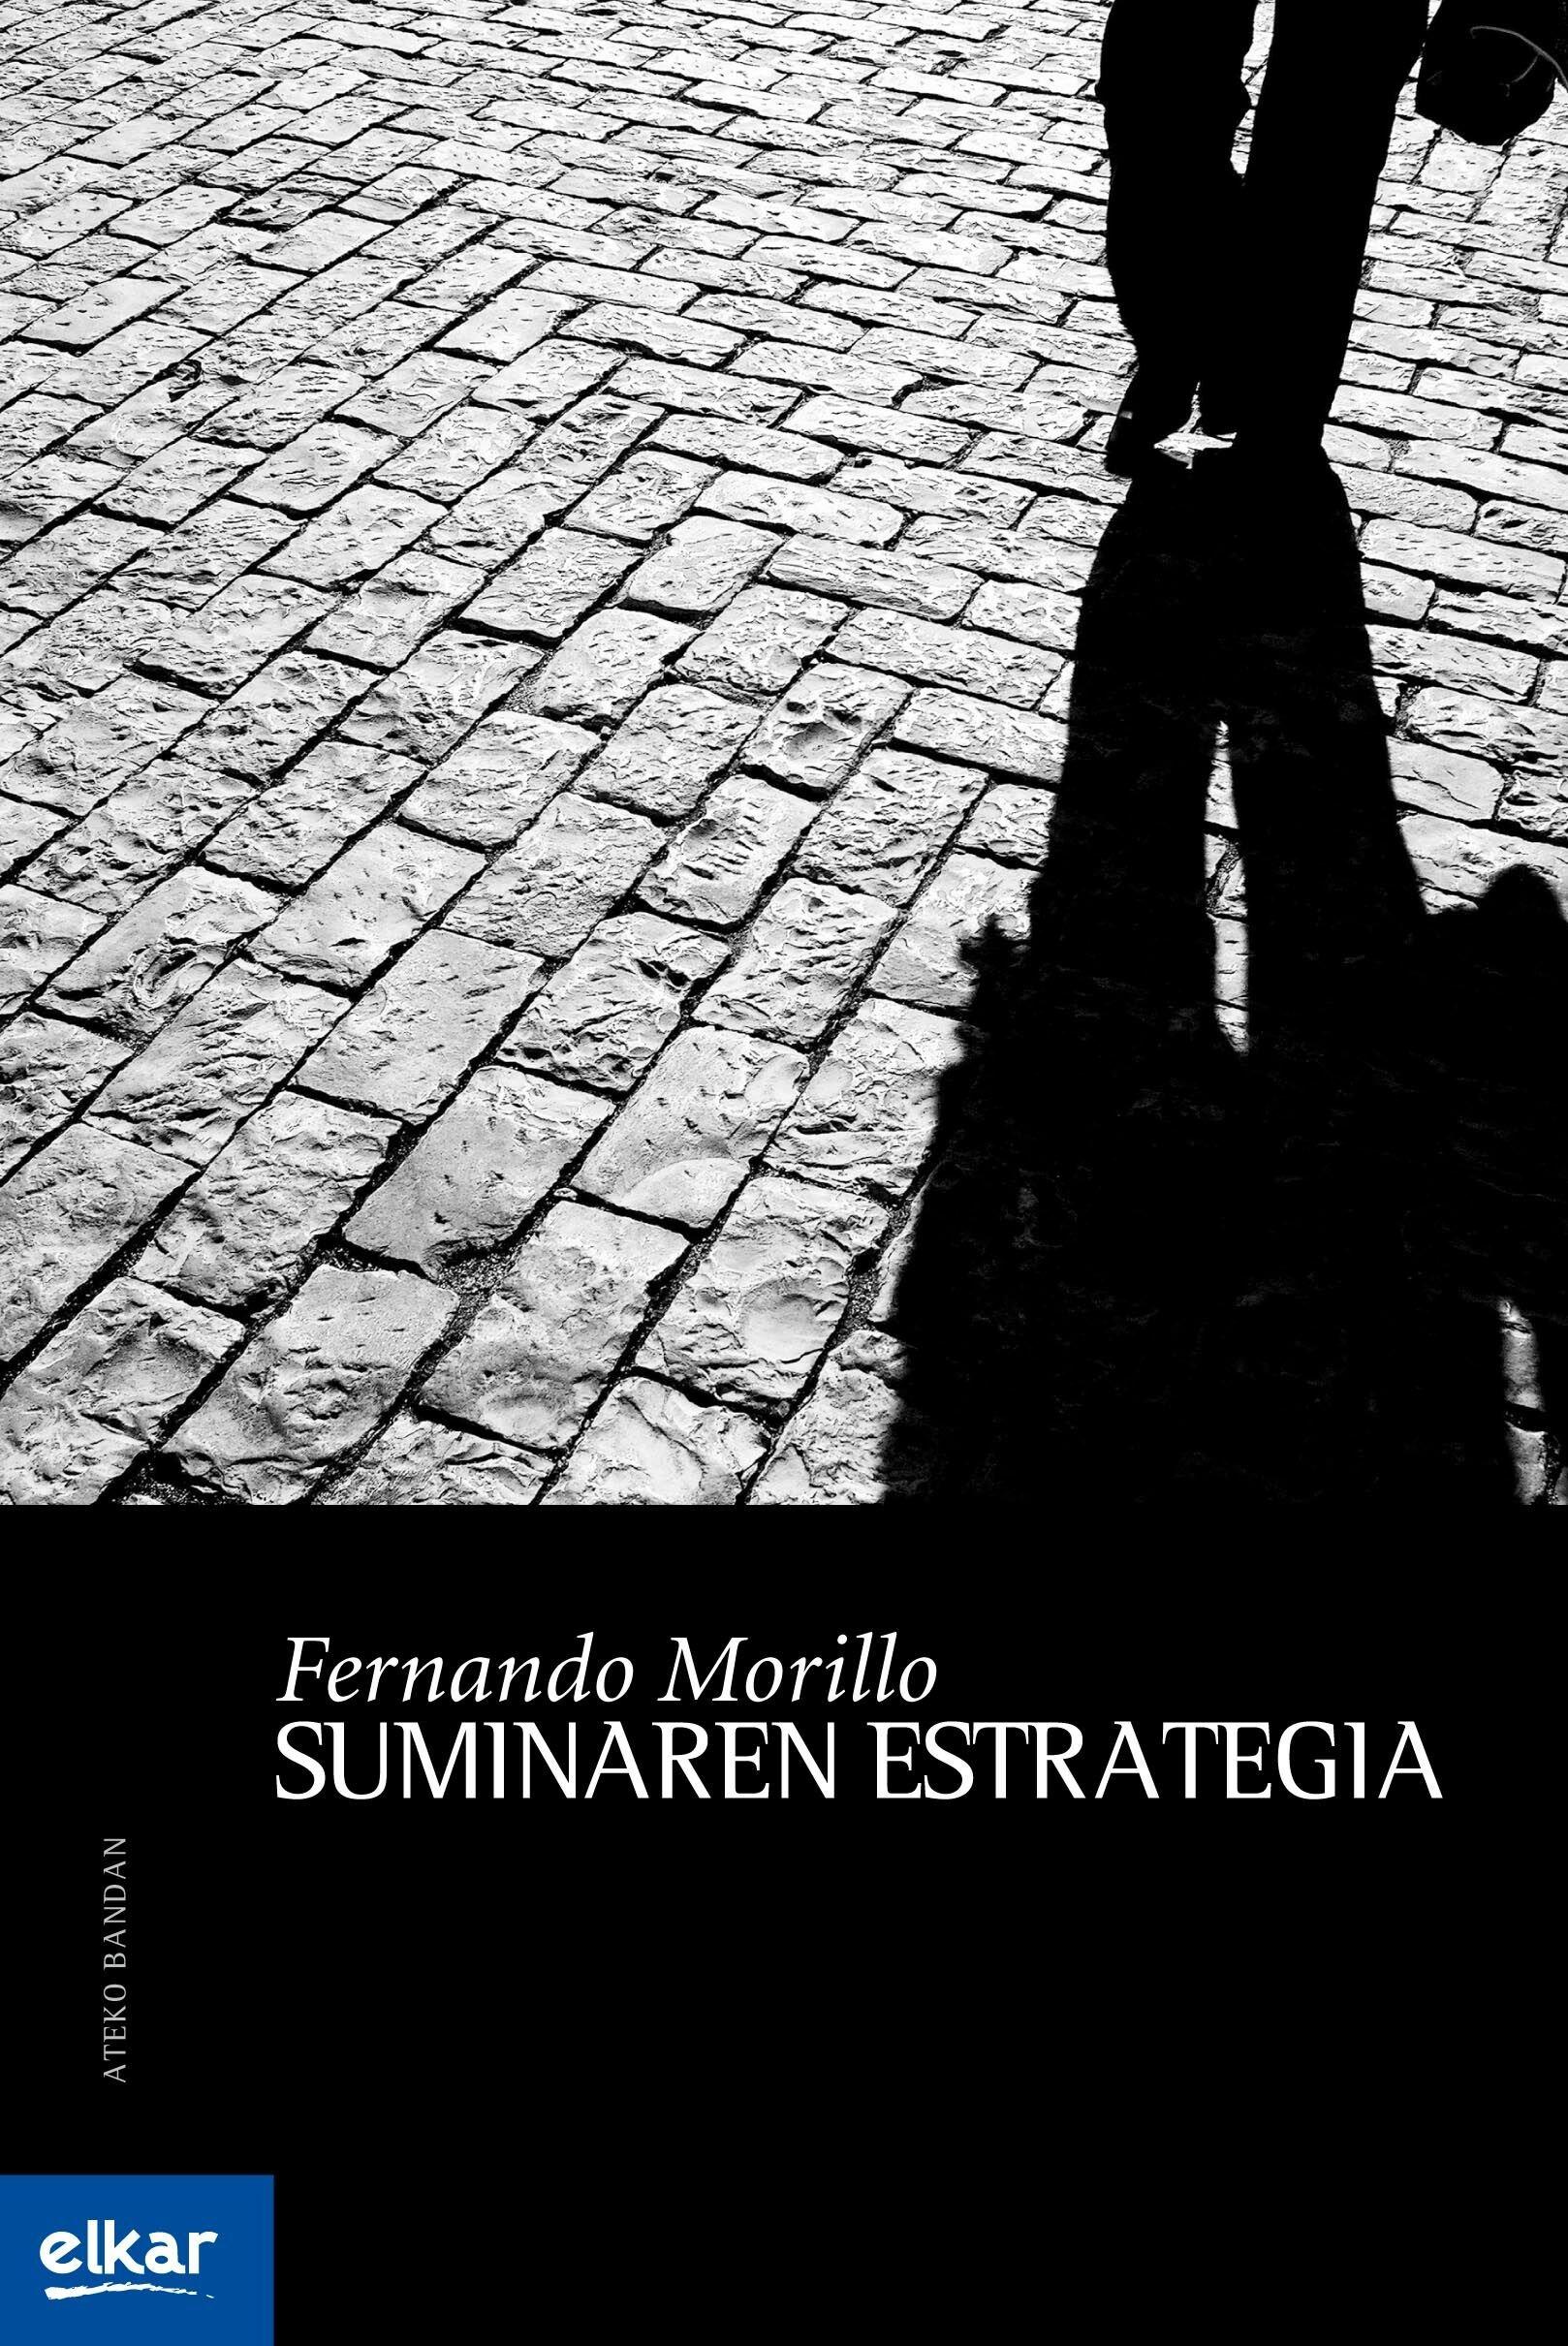 Suminaren estrategia (Ateko bandan) (Euskera) Tapa blanda – 31 mar 2008 Fernando Morillo Grande Elkarlanean S.L. 8497835743